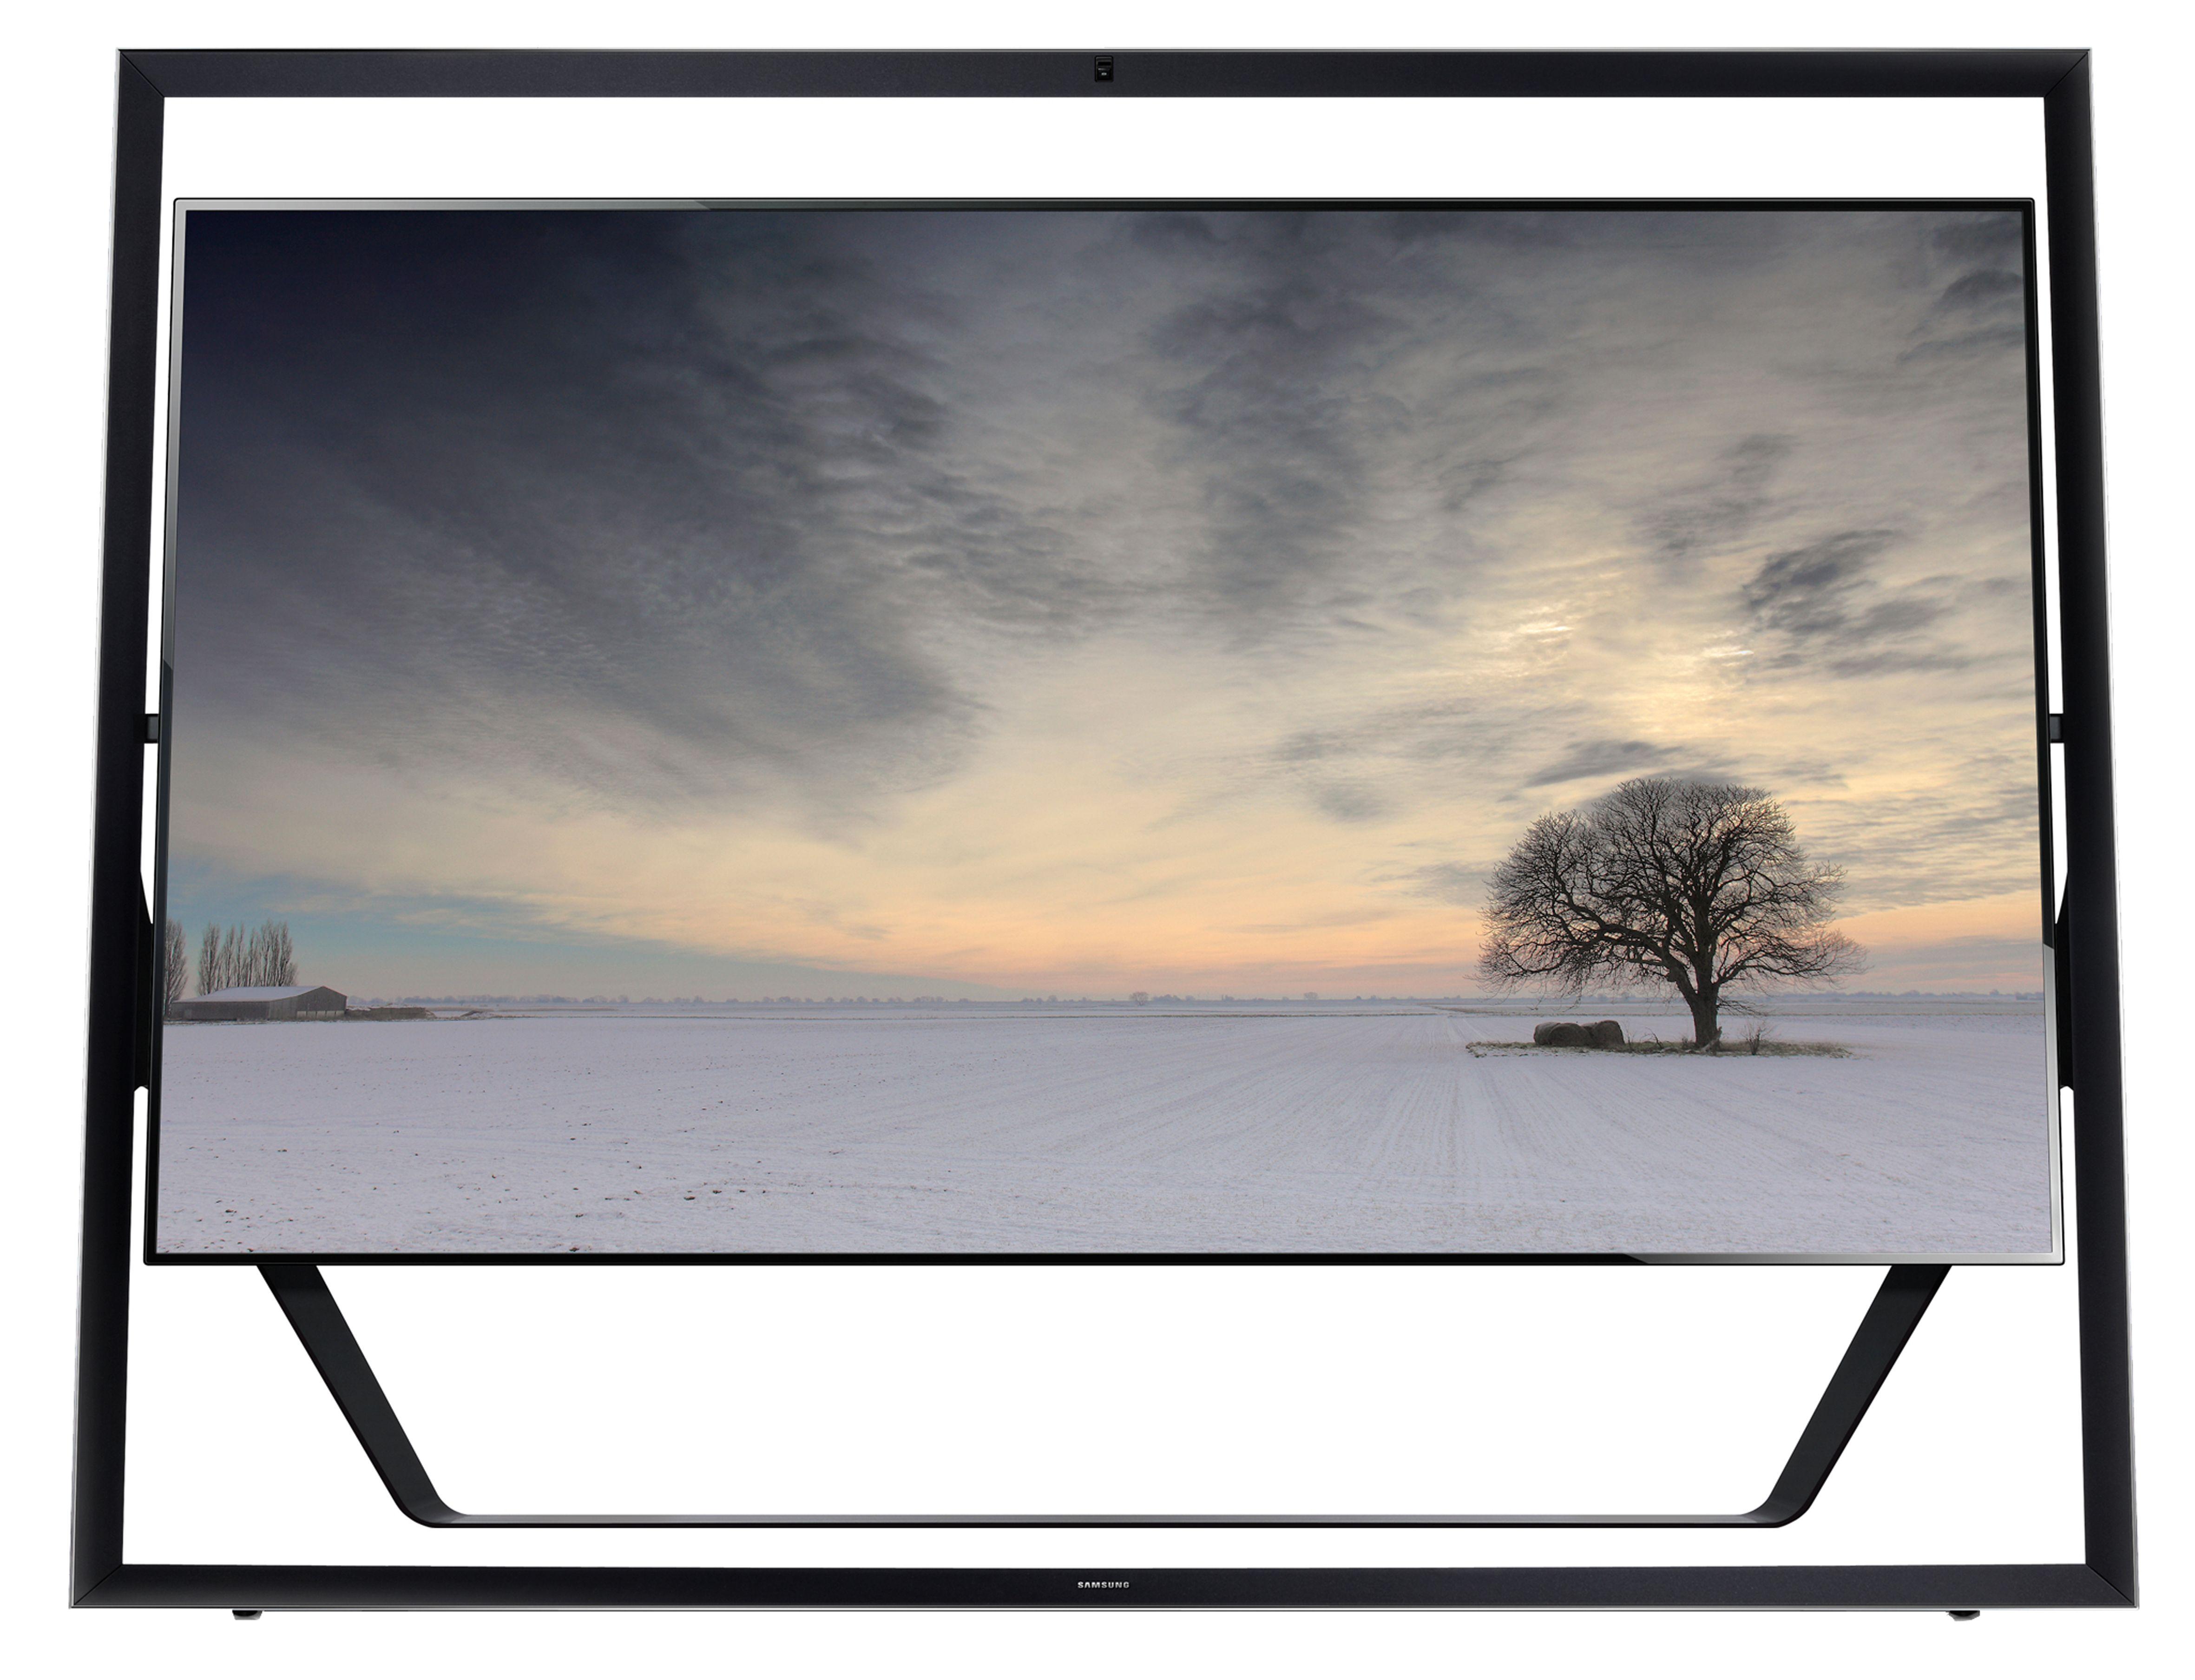 Las Mejores Bromas De Rigo Samsung Televisor Tecnologia